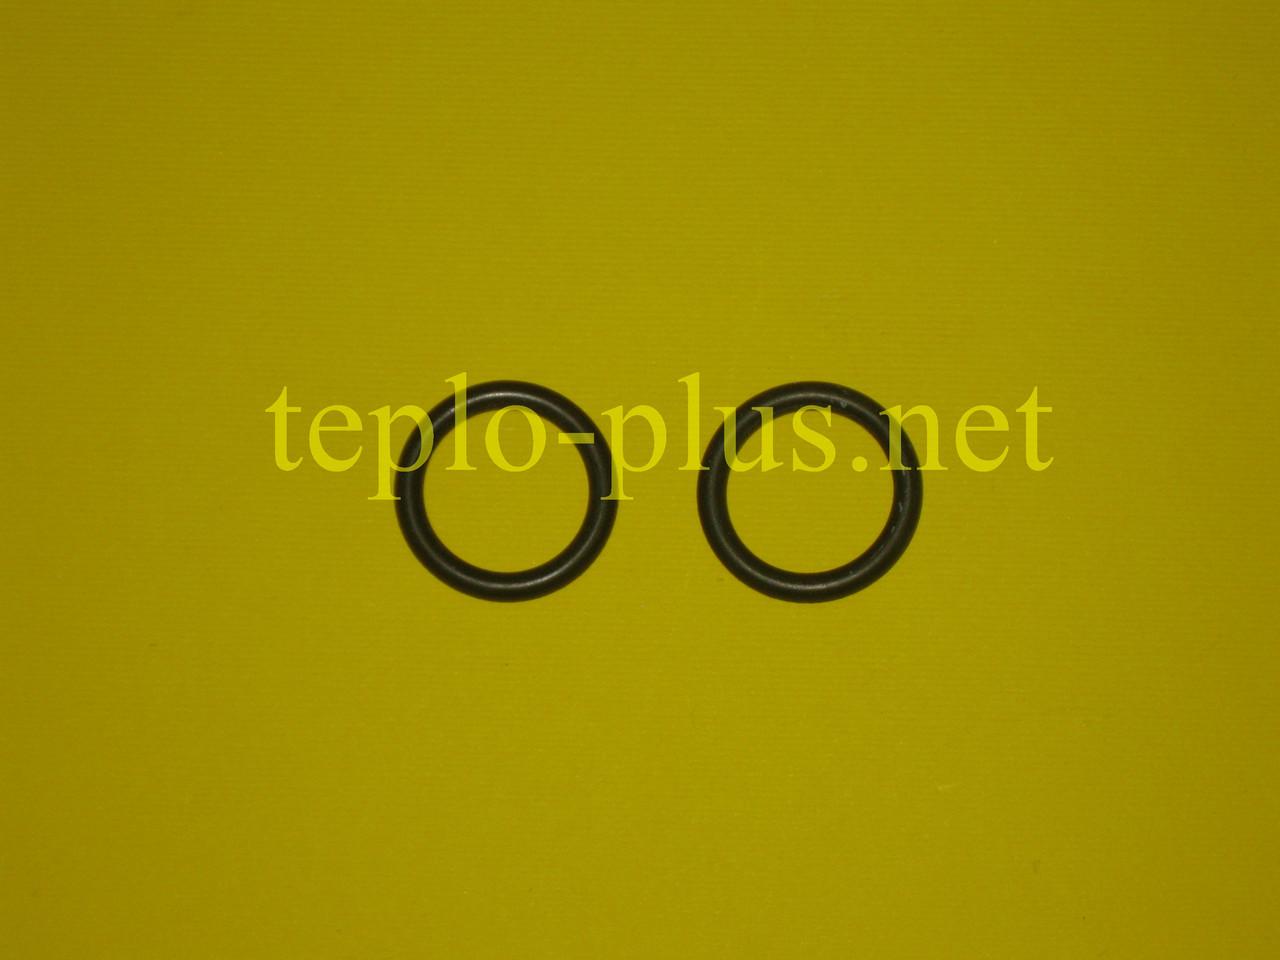 Комплект прокладок теплообменника первичного (основного) 103415 Vaillant ecoBLOCK, ecoTEC, ecoVIT, ecoCOMPACT